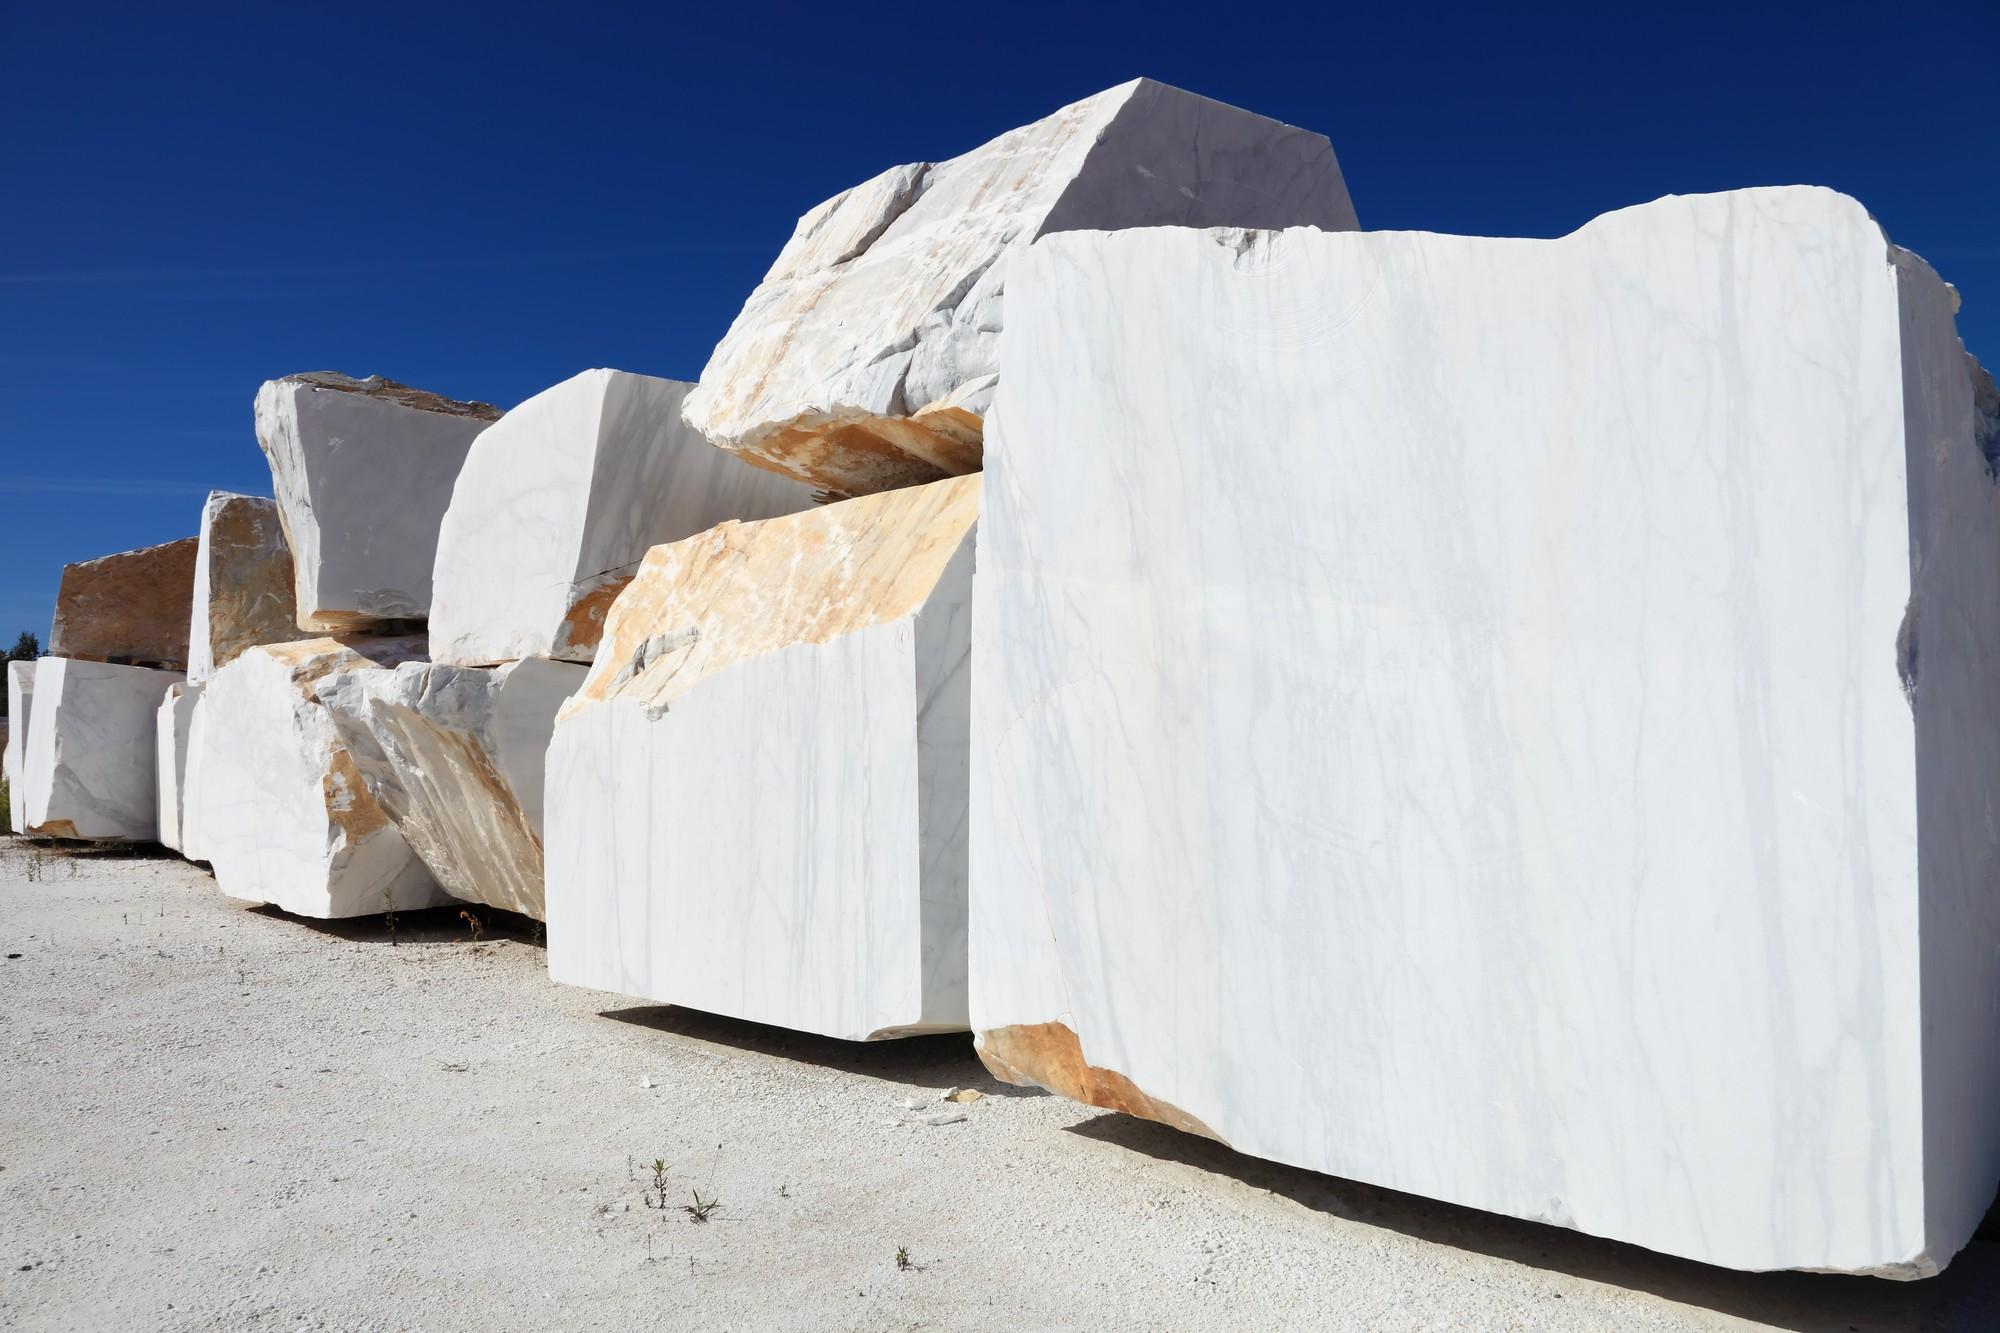 Calacatta-gold-marble-slabs